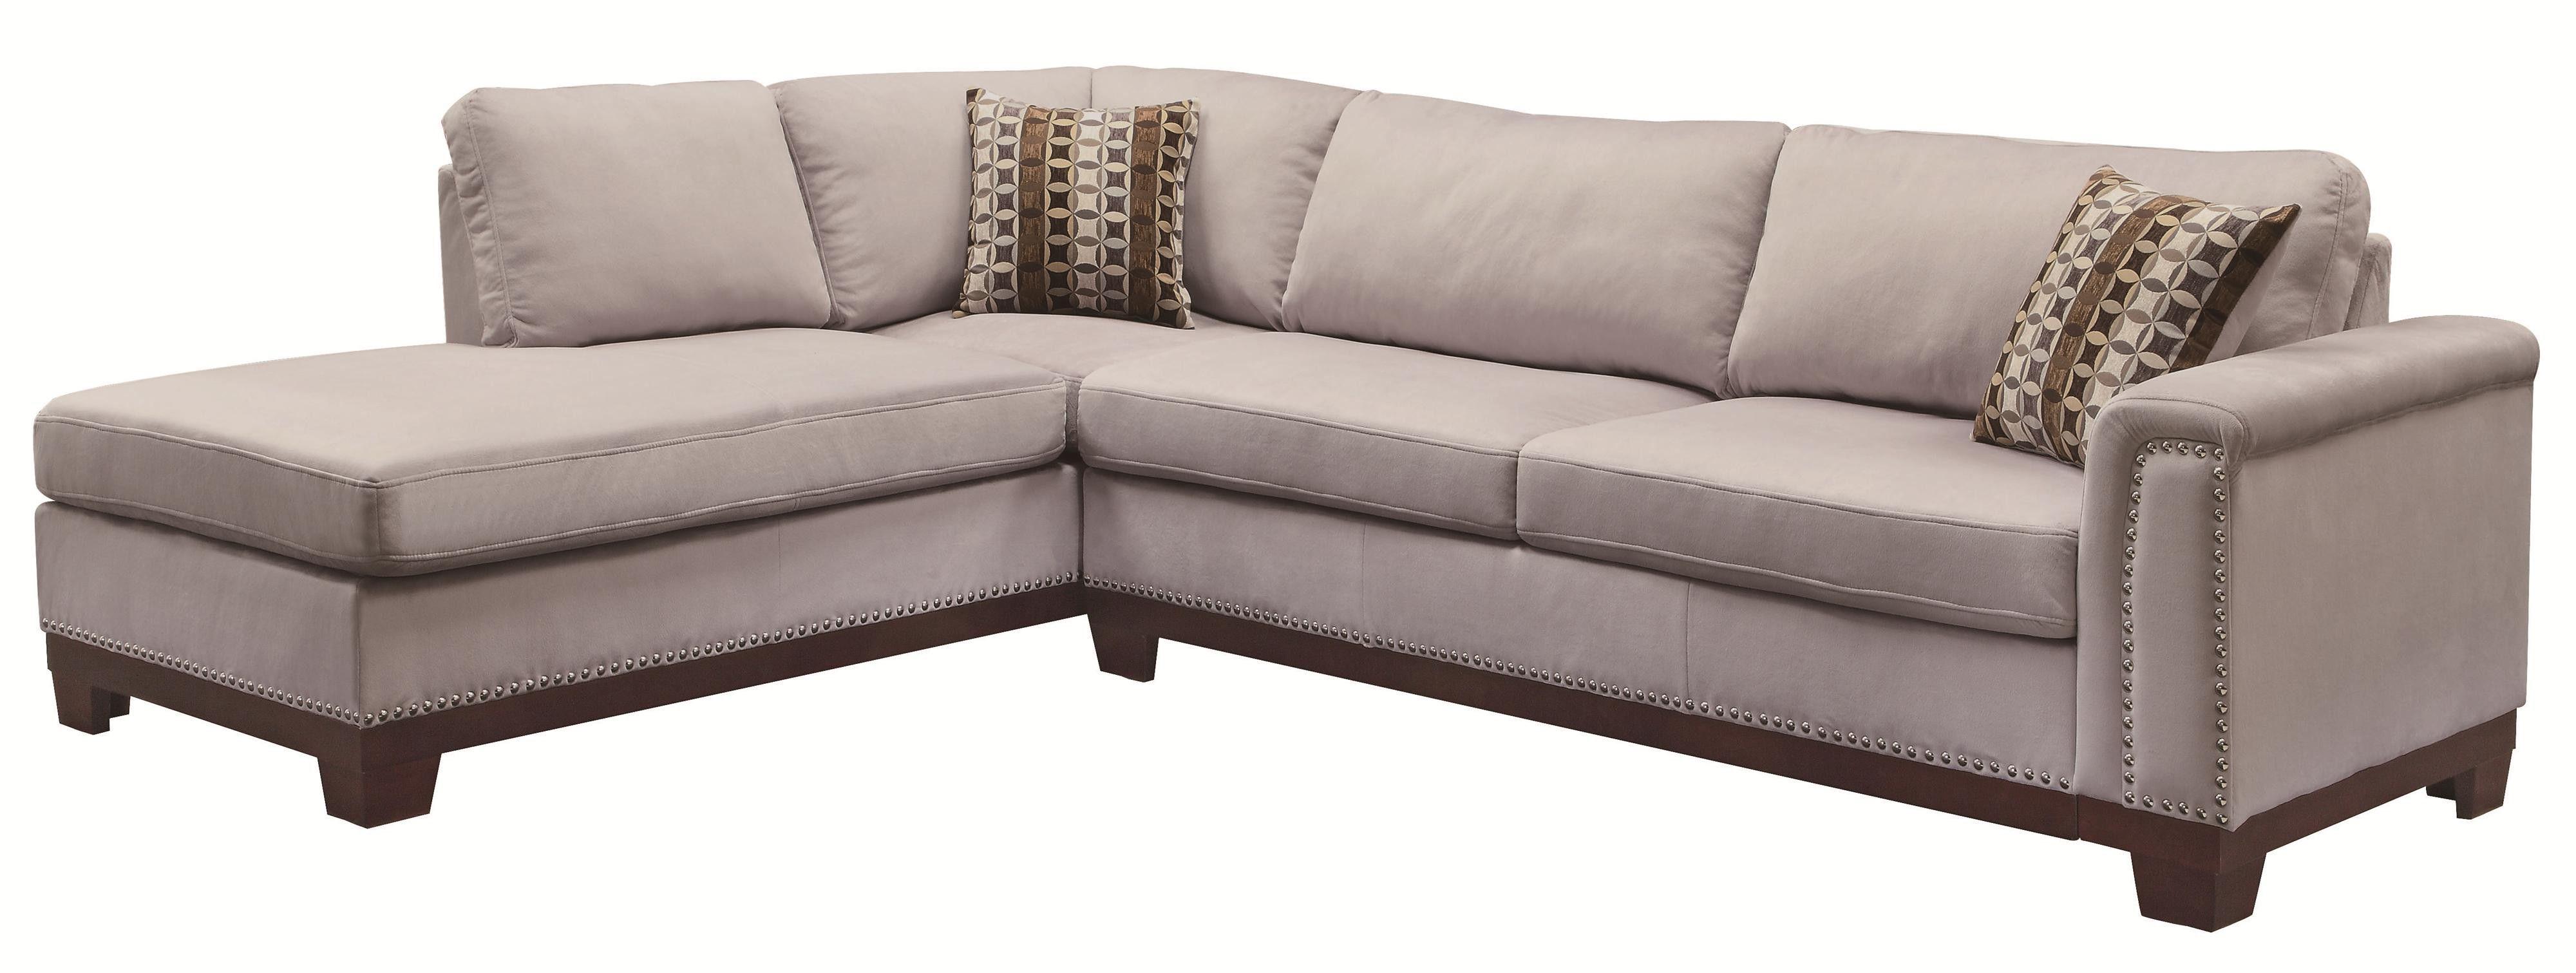 Coaster Mason Track Arm Reversible Sofa Chaise Sectional 503615 ...